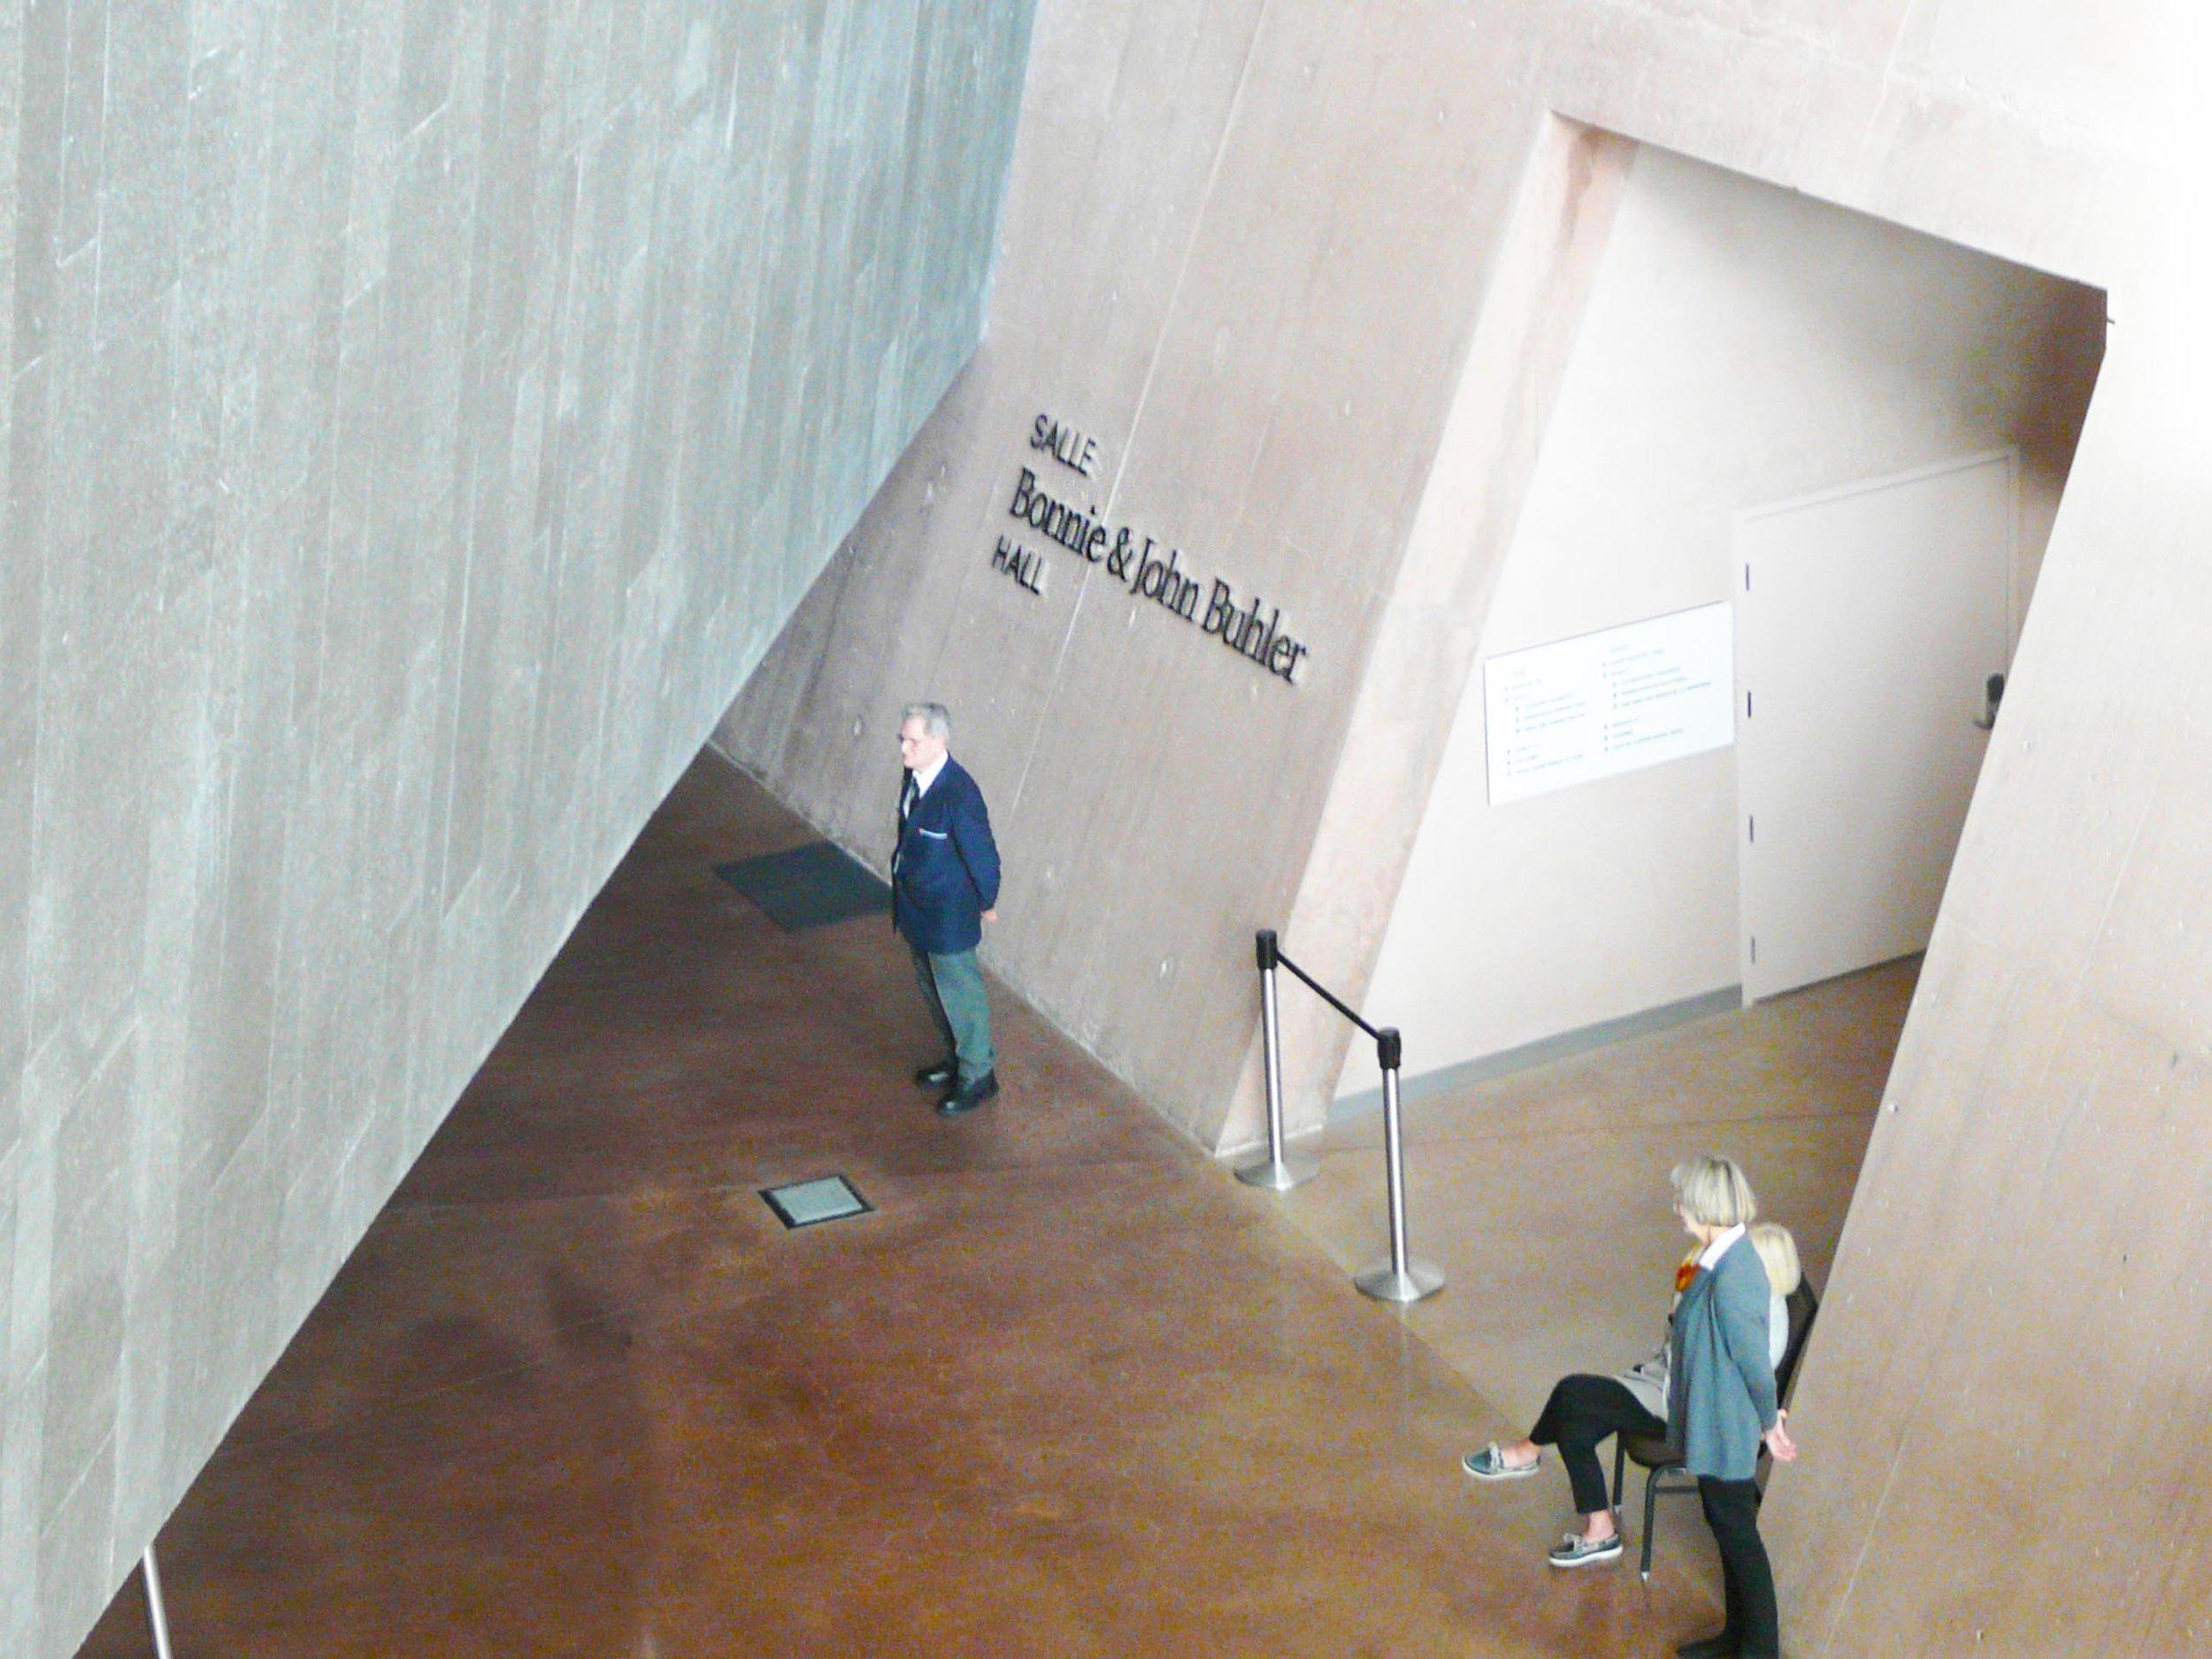 Museum sign interior.jpg